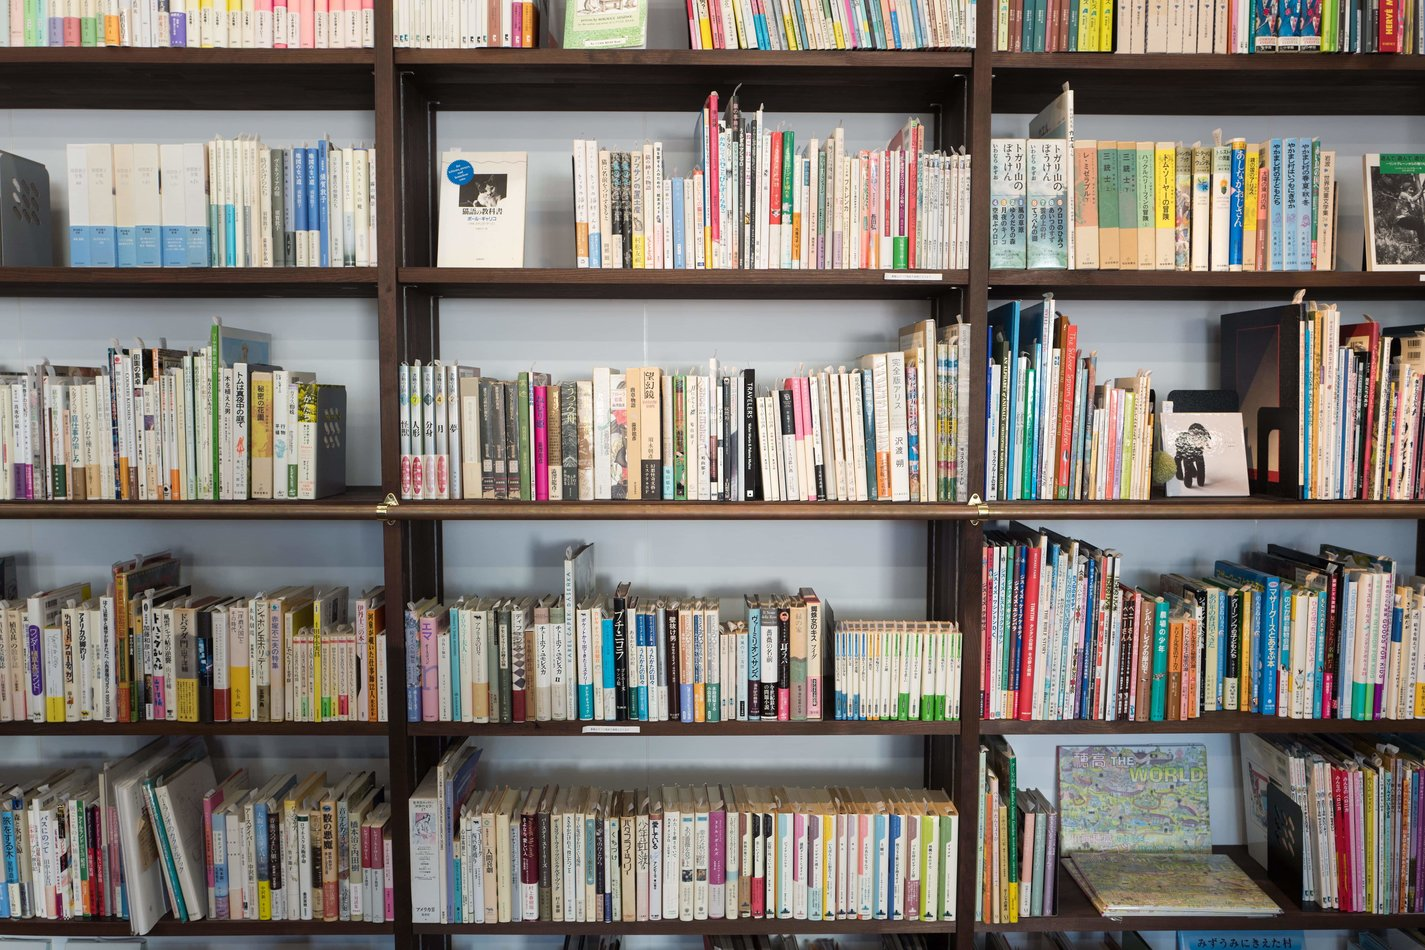 Home decor with books